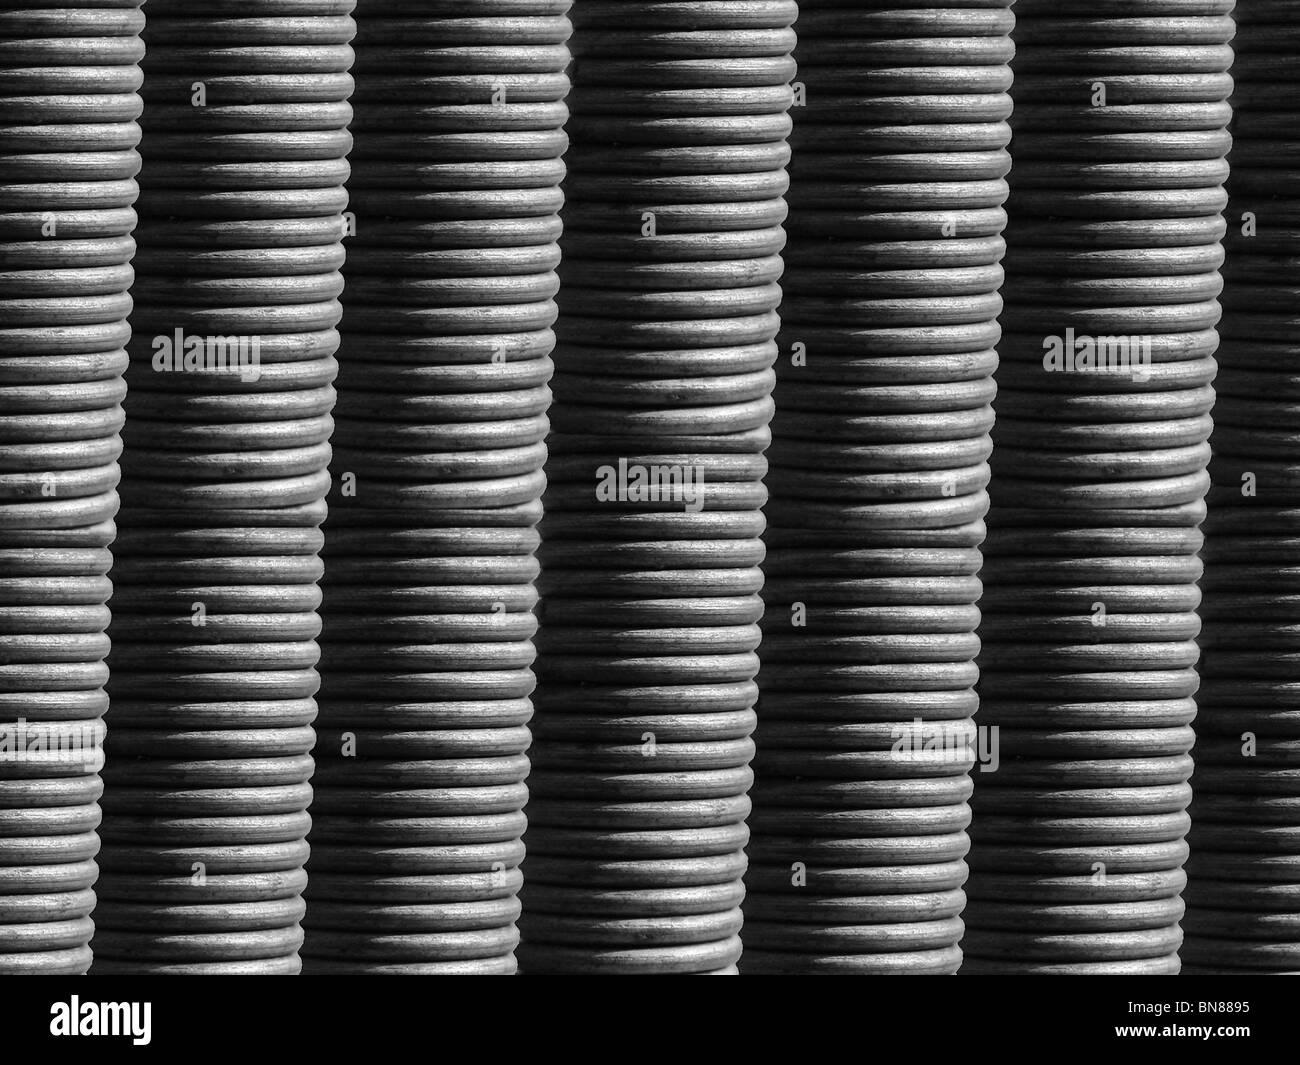 Bunch of spirals - Stock Image